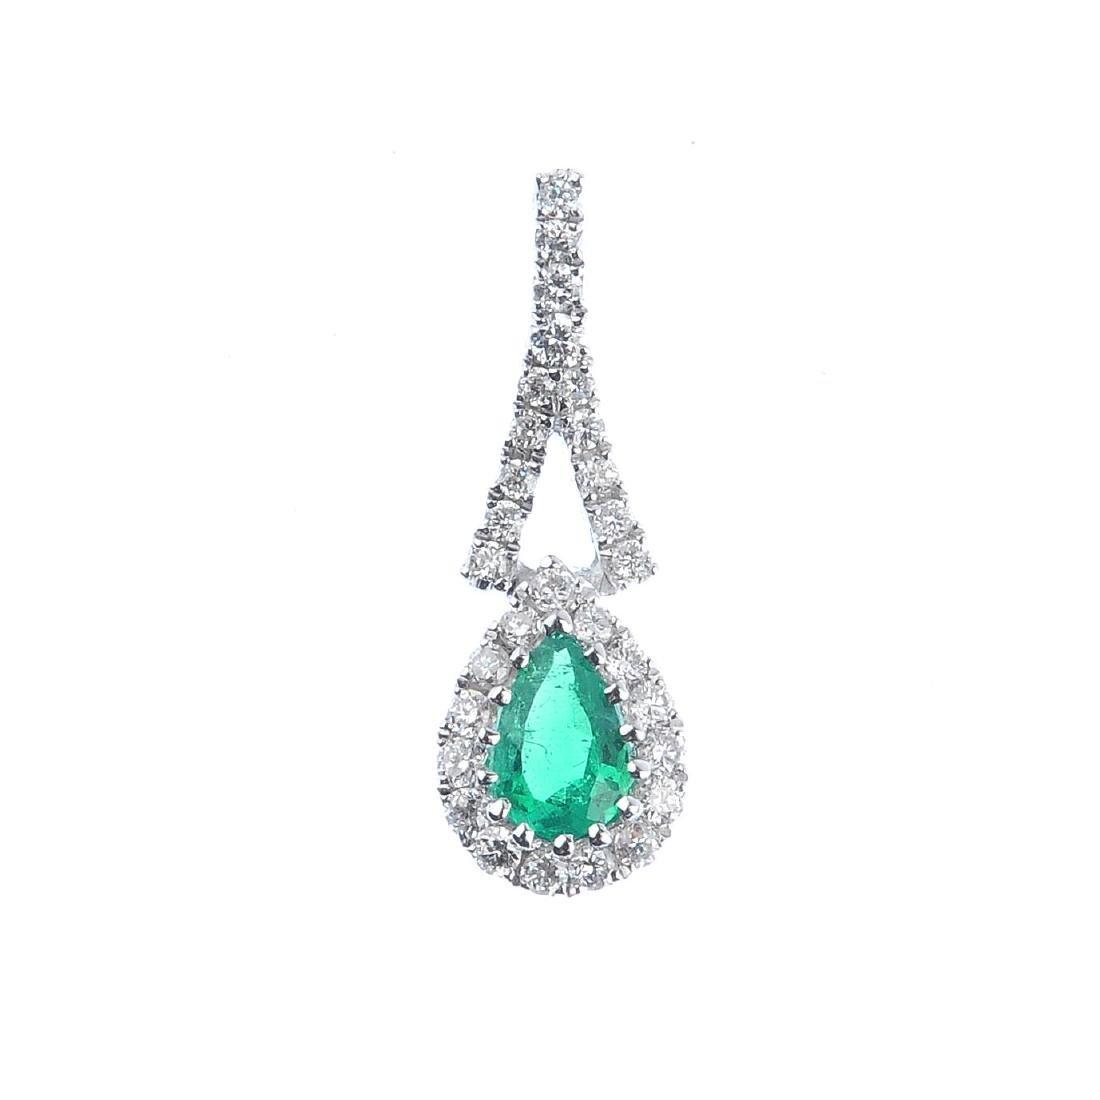 An emerald and diamond pendant. The pear-shape emerald,